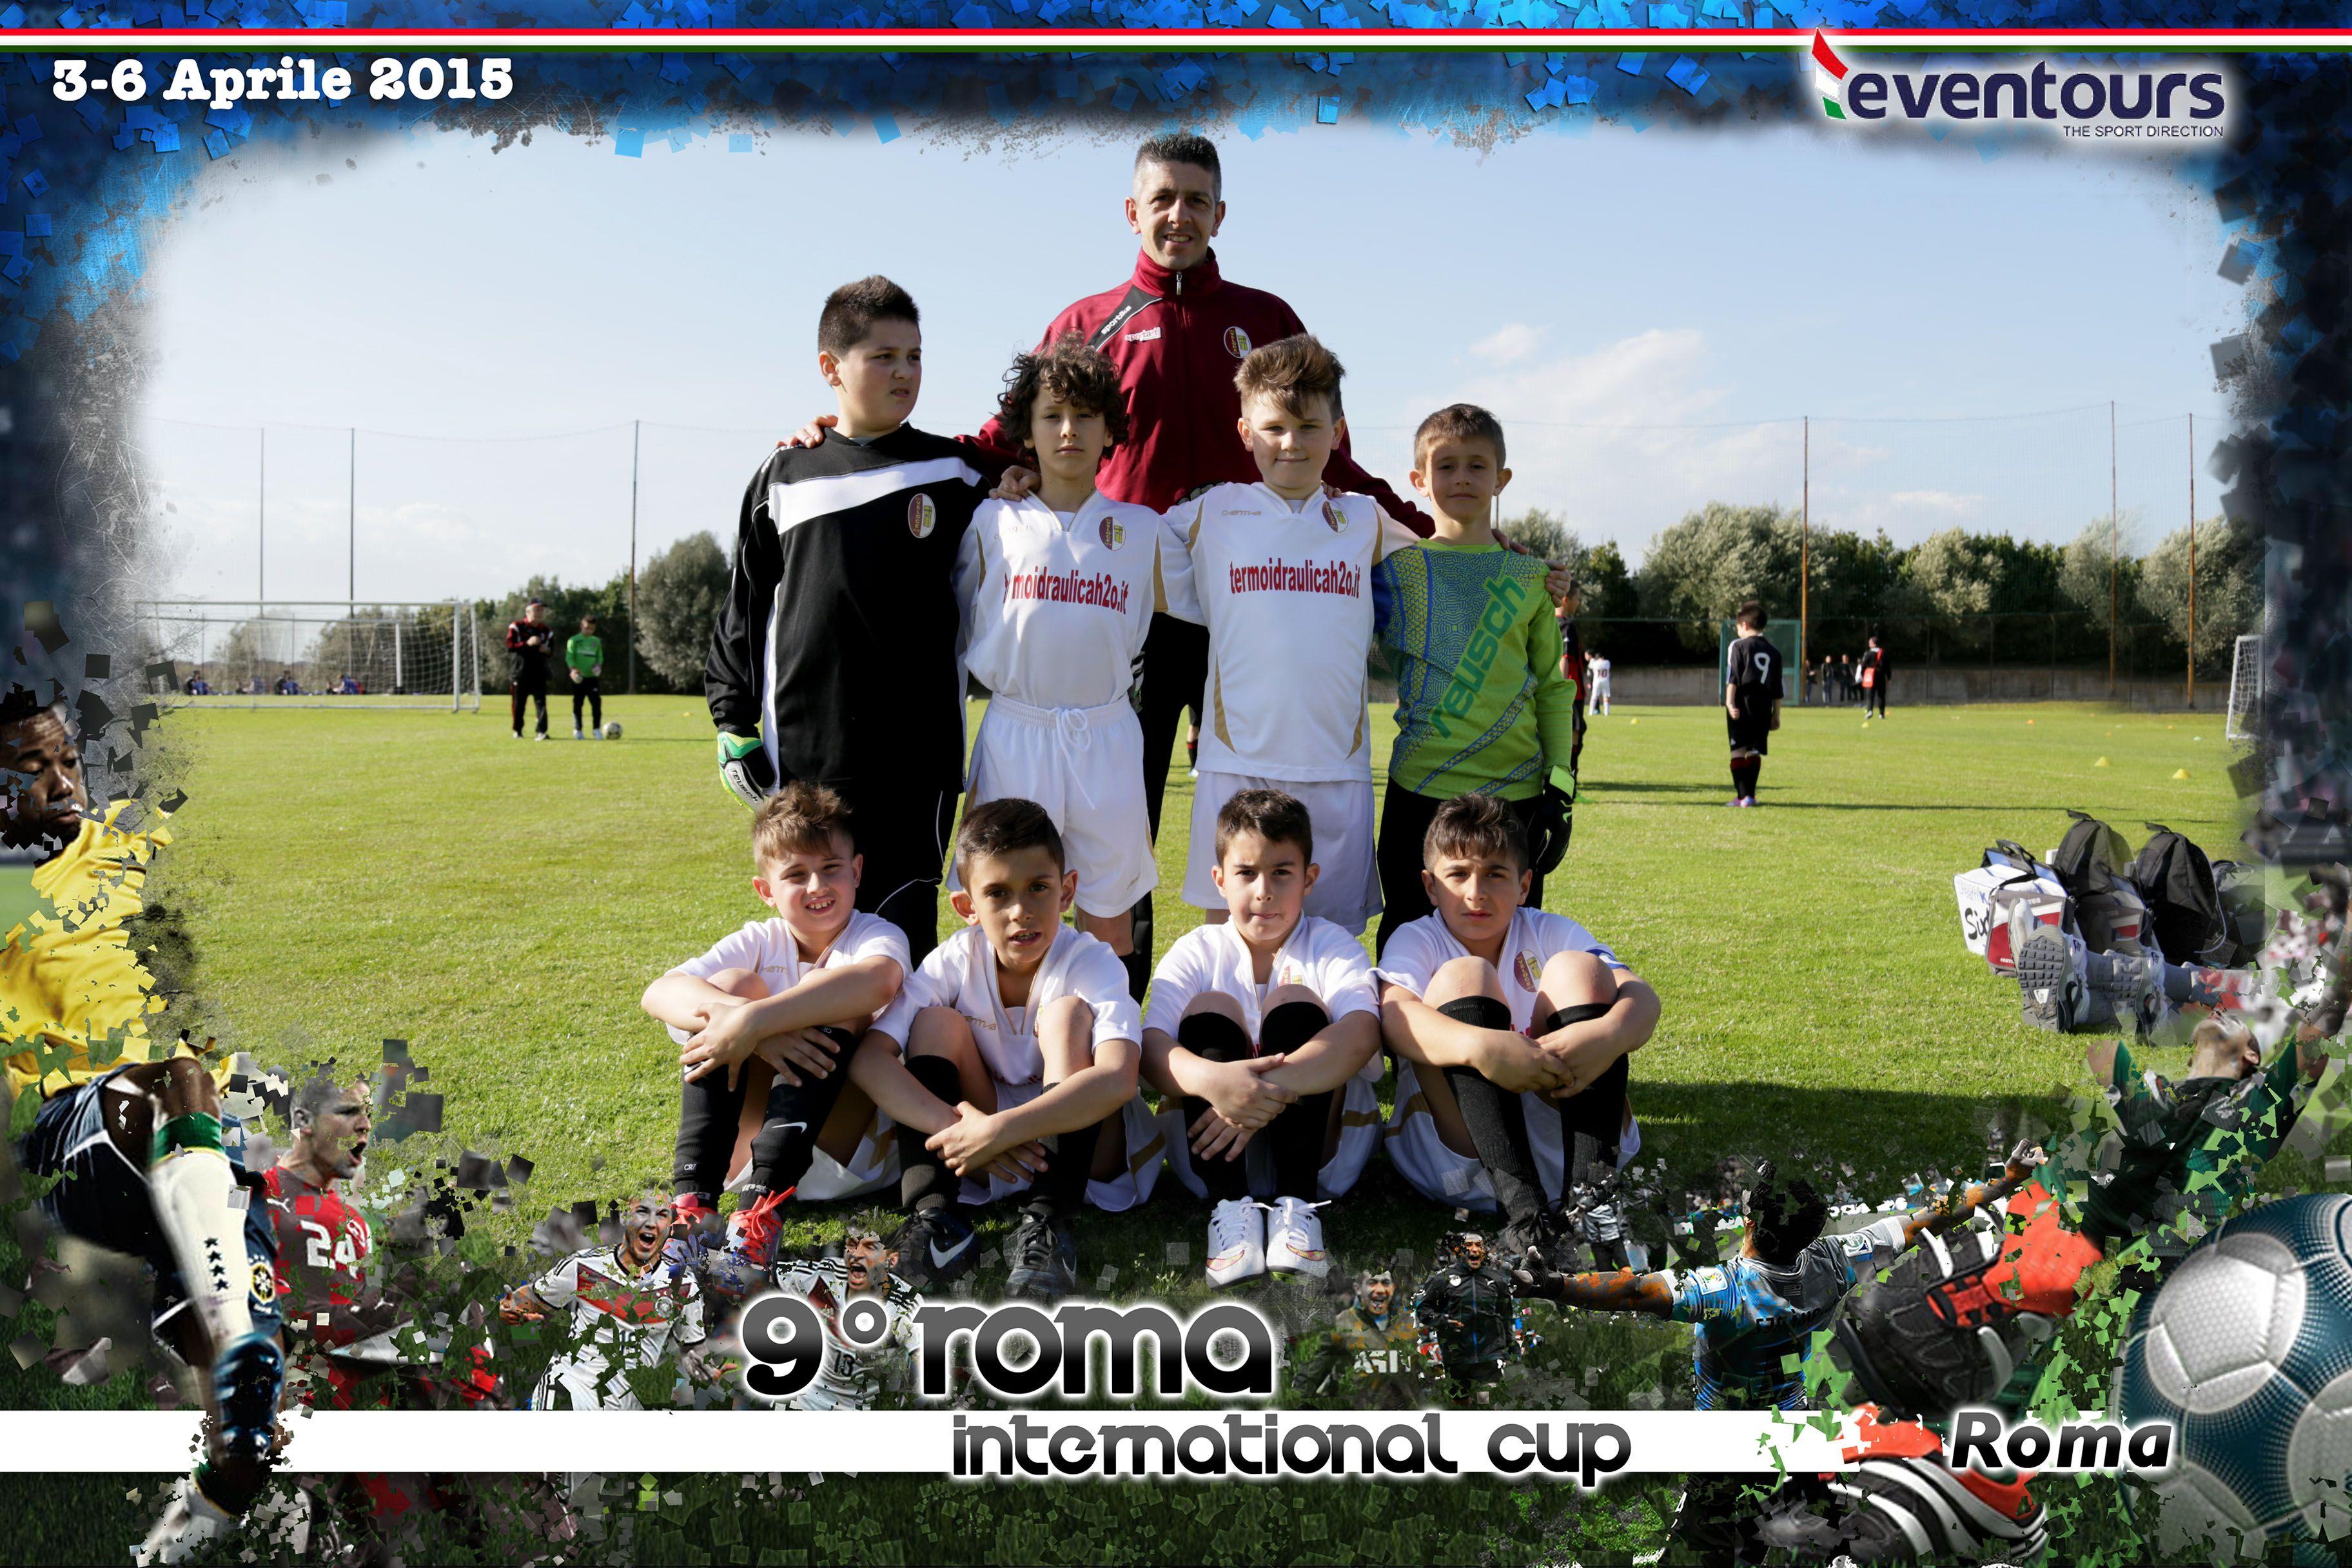 Pin di Eventours srl su 9° Roma International Cup (2015